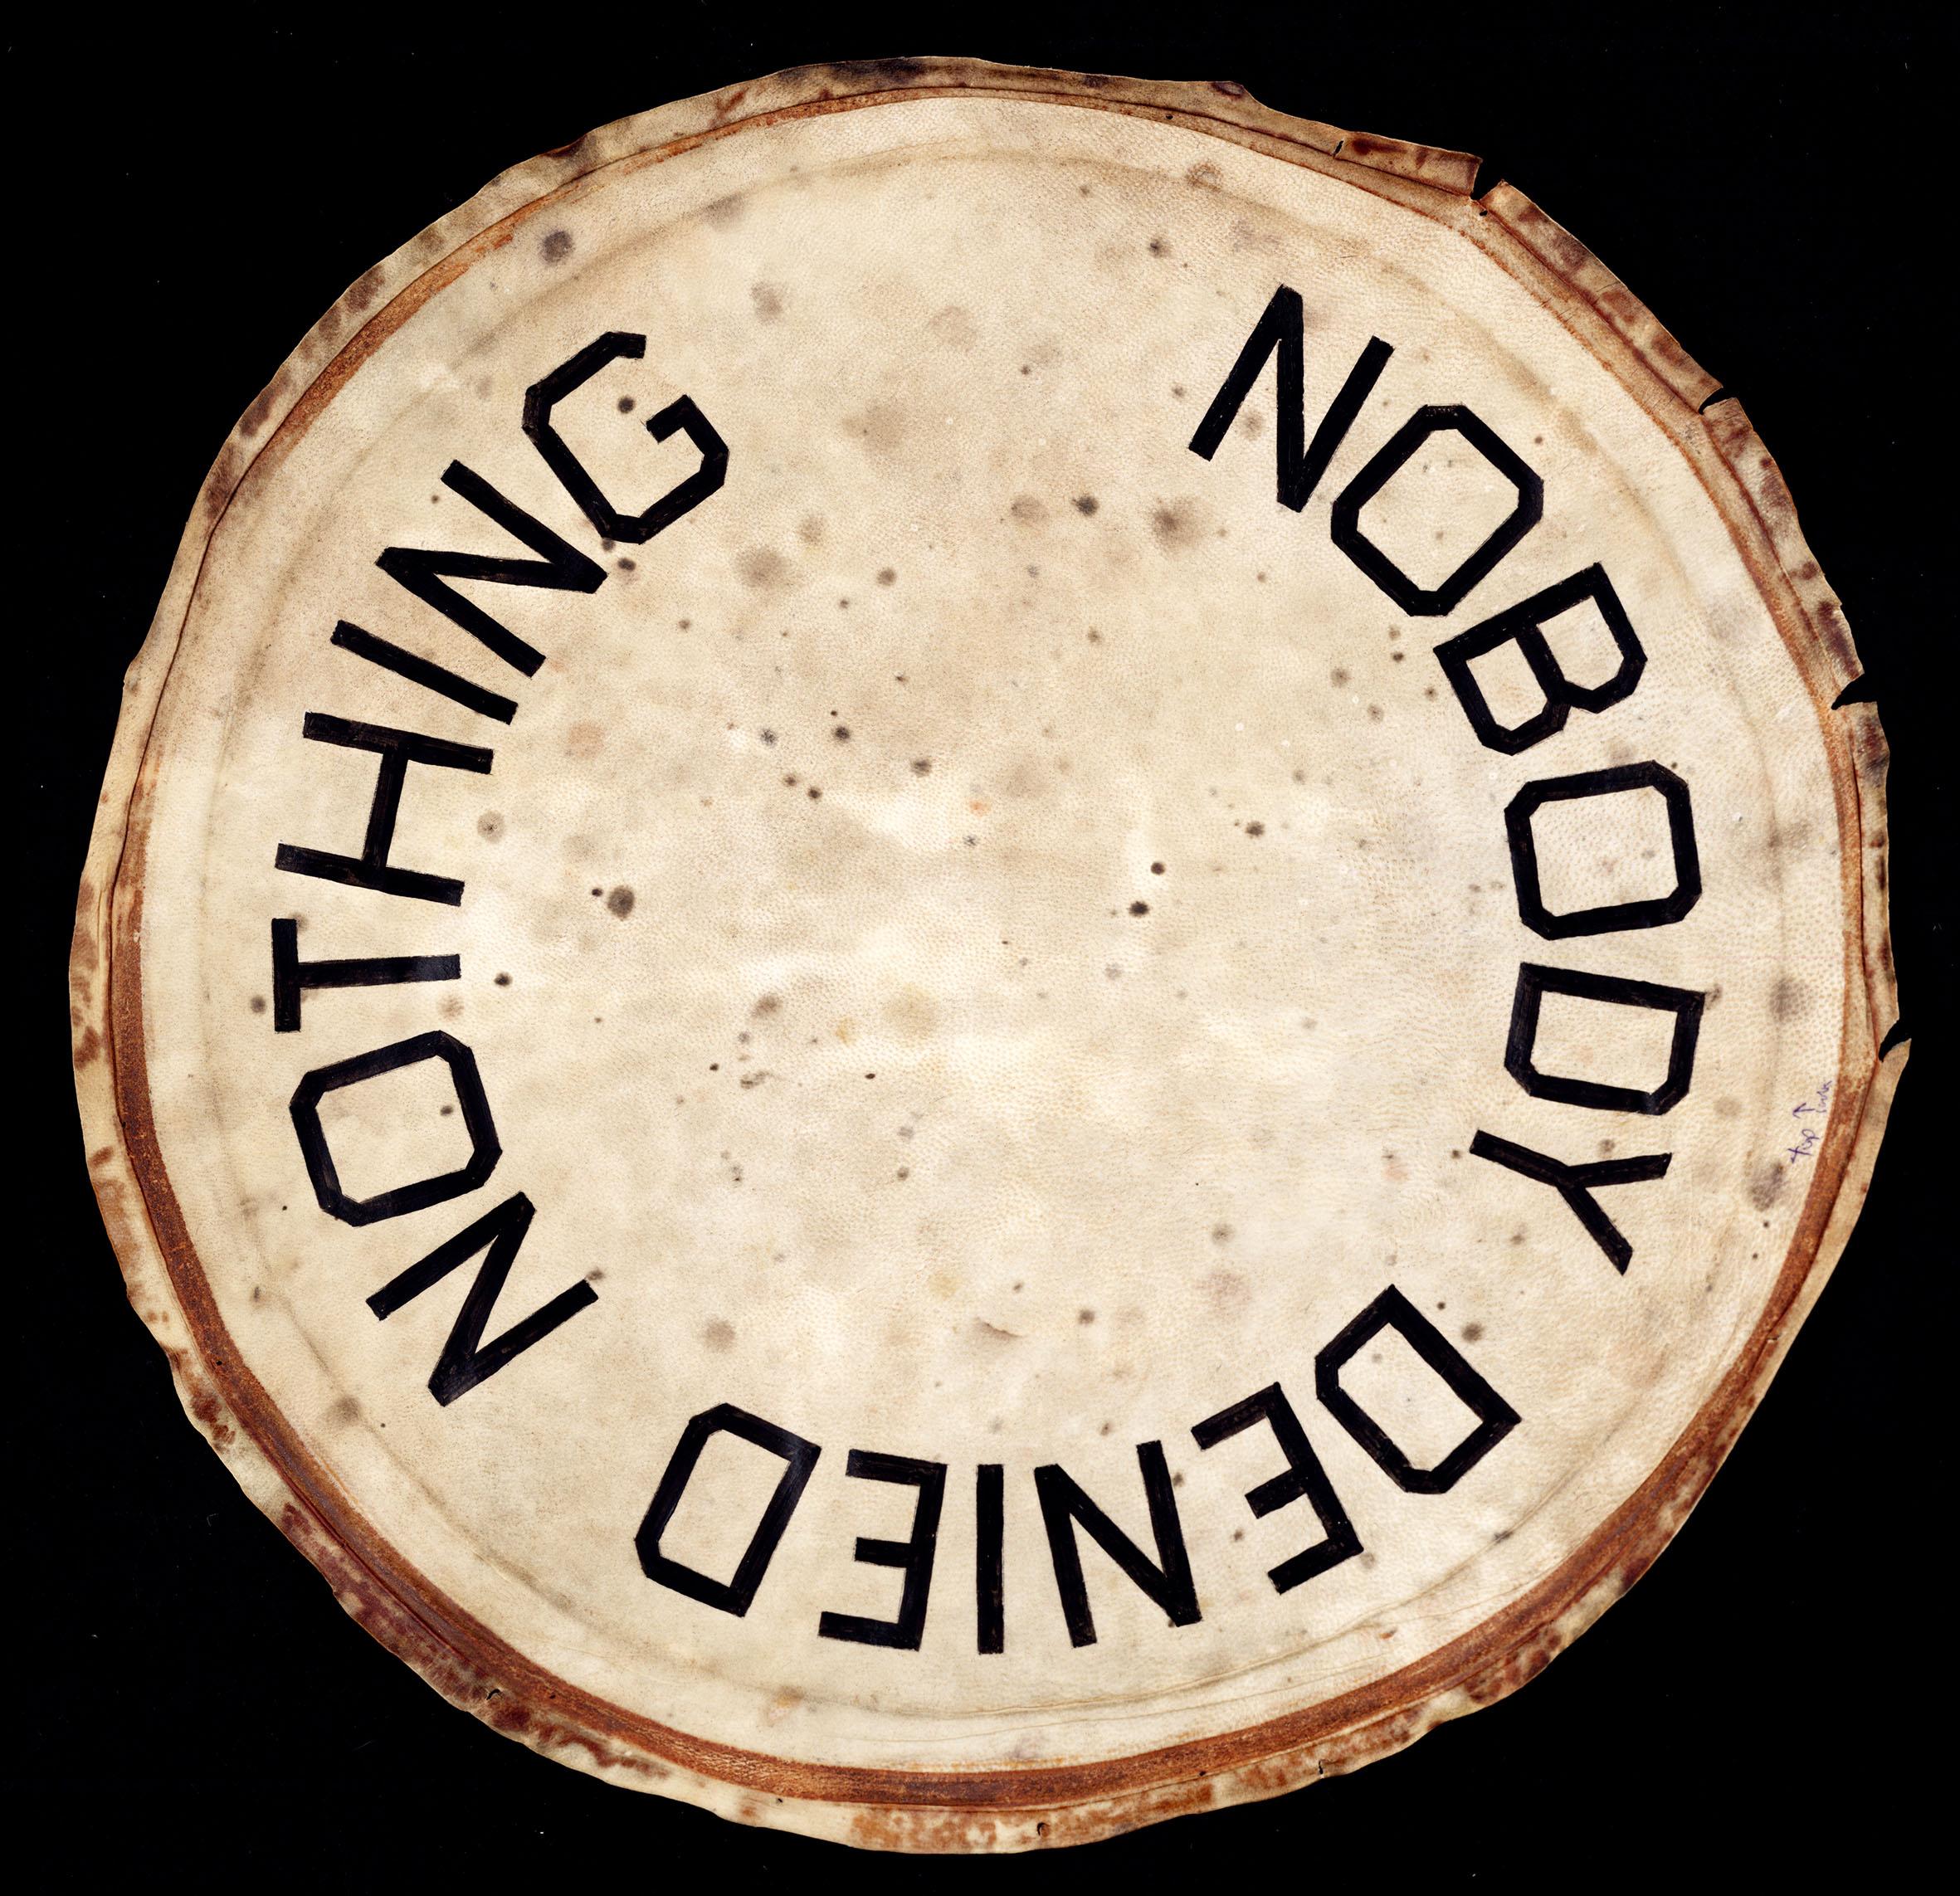 Ed Ruscha, Nobody Denied Nothing, 2018, Acryl auf Pergament, ©Ed Ruscha, courtesy of the artist and Gagosian